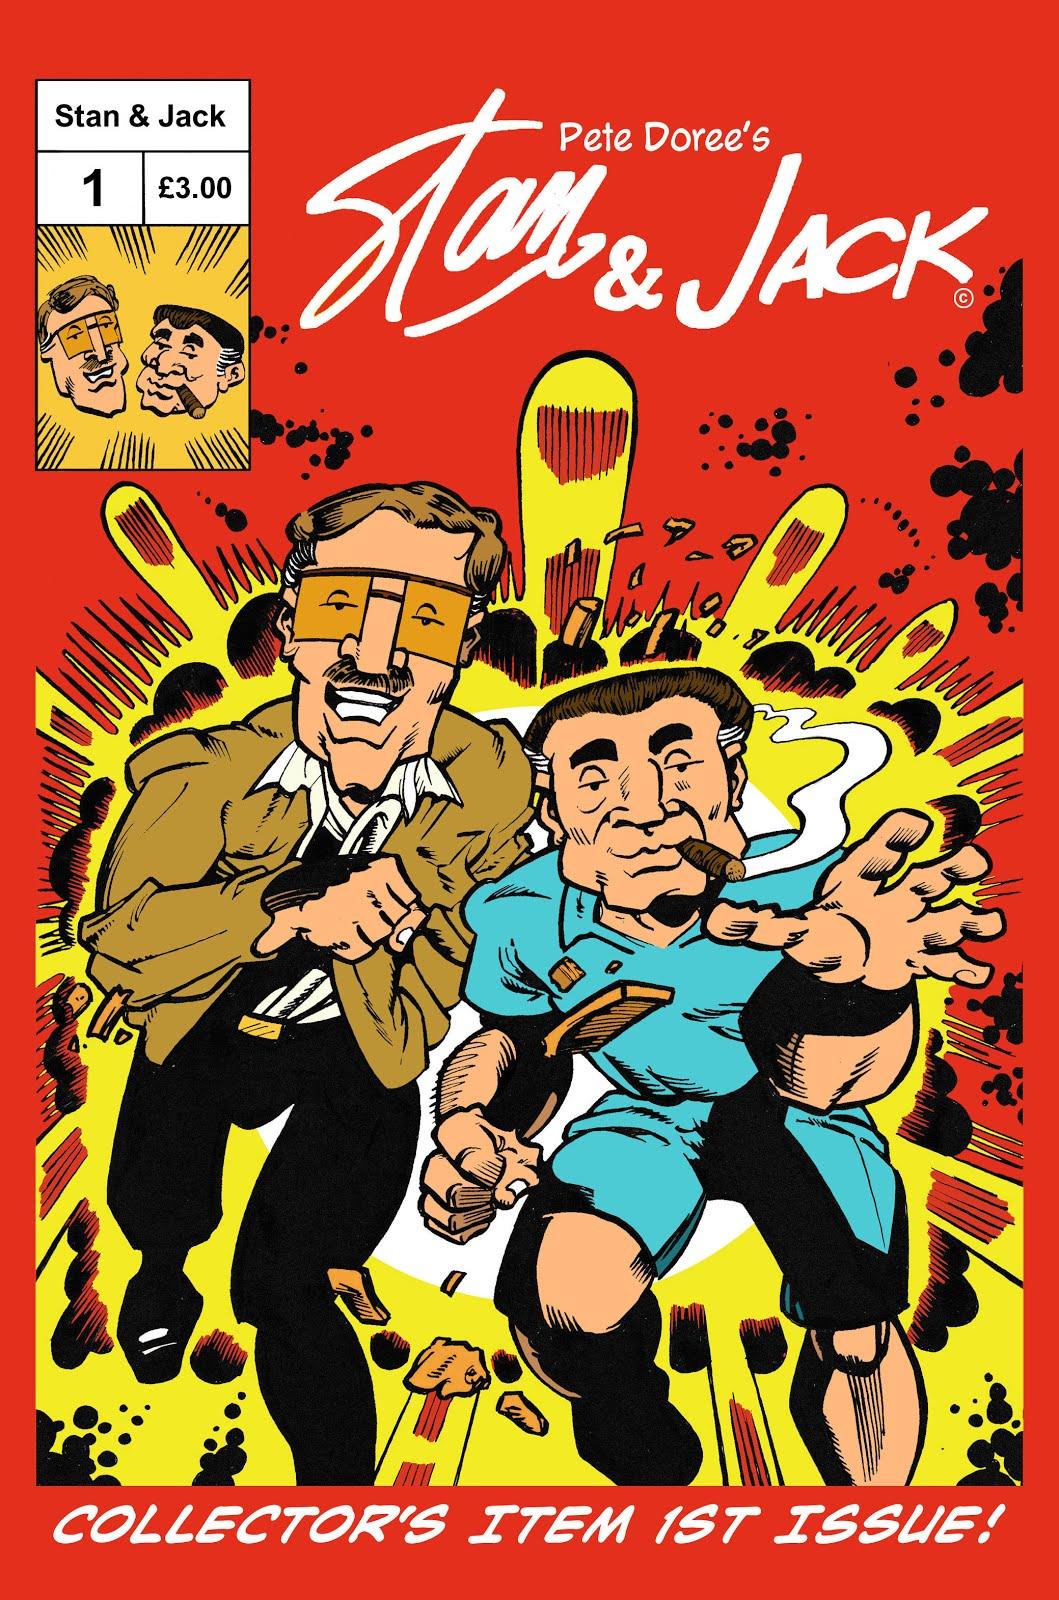 Read Stan & Jack #1!